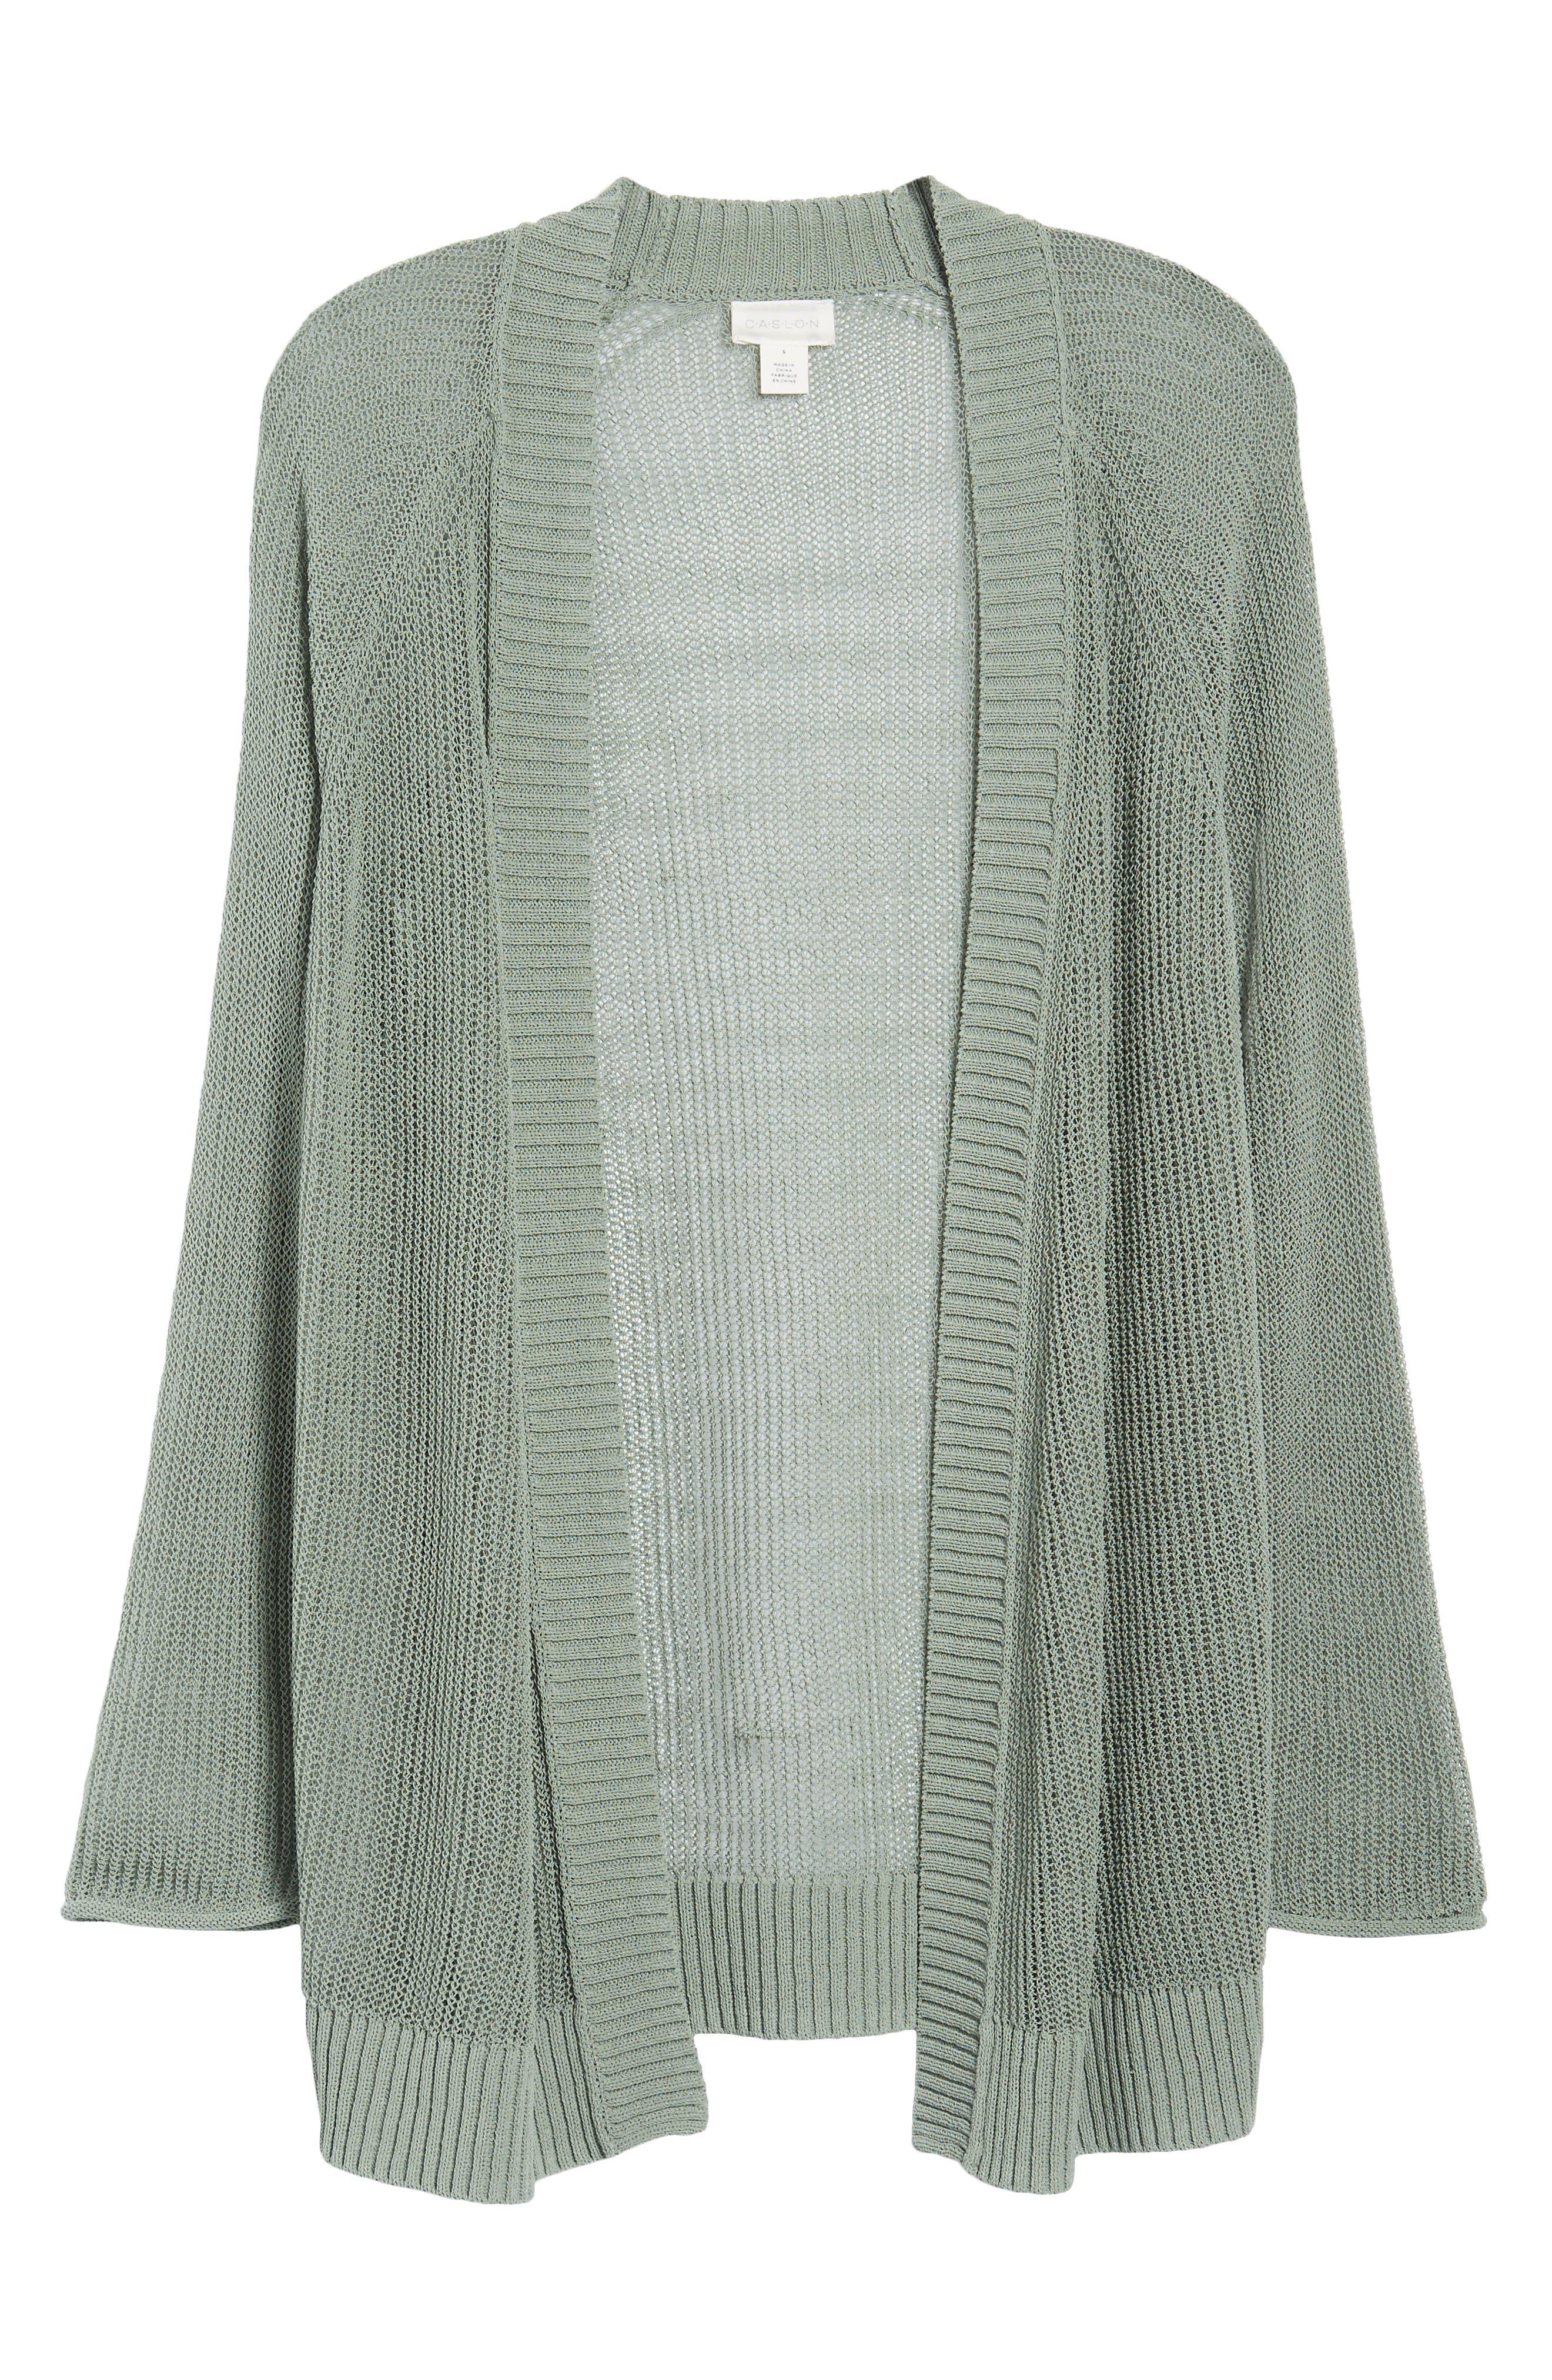 Open Cotton Blend Cardigan,                             Alternate thumbnail 6, color,                             Green Lilypad